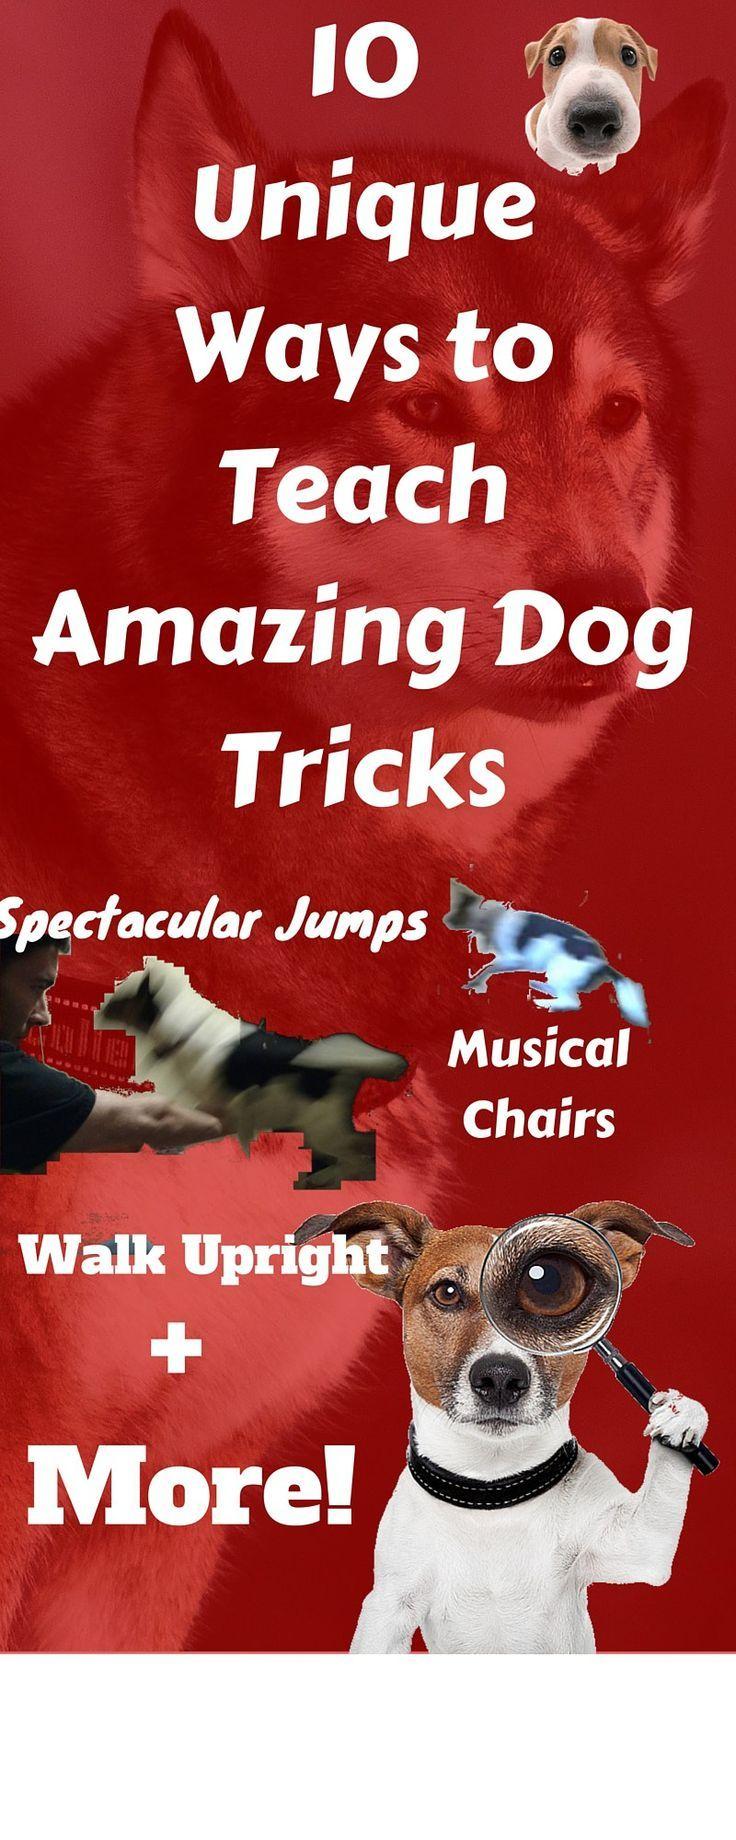 10 Unique Ways to Teach Amazing Dog Tricks | Impressive dog jumps, skateboarding, army crawl & so much more!